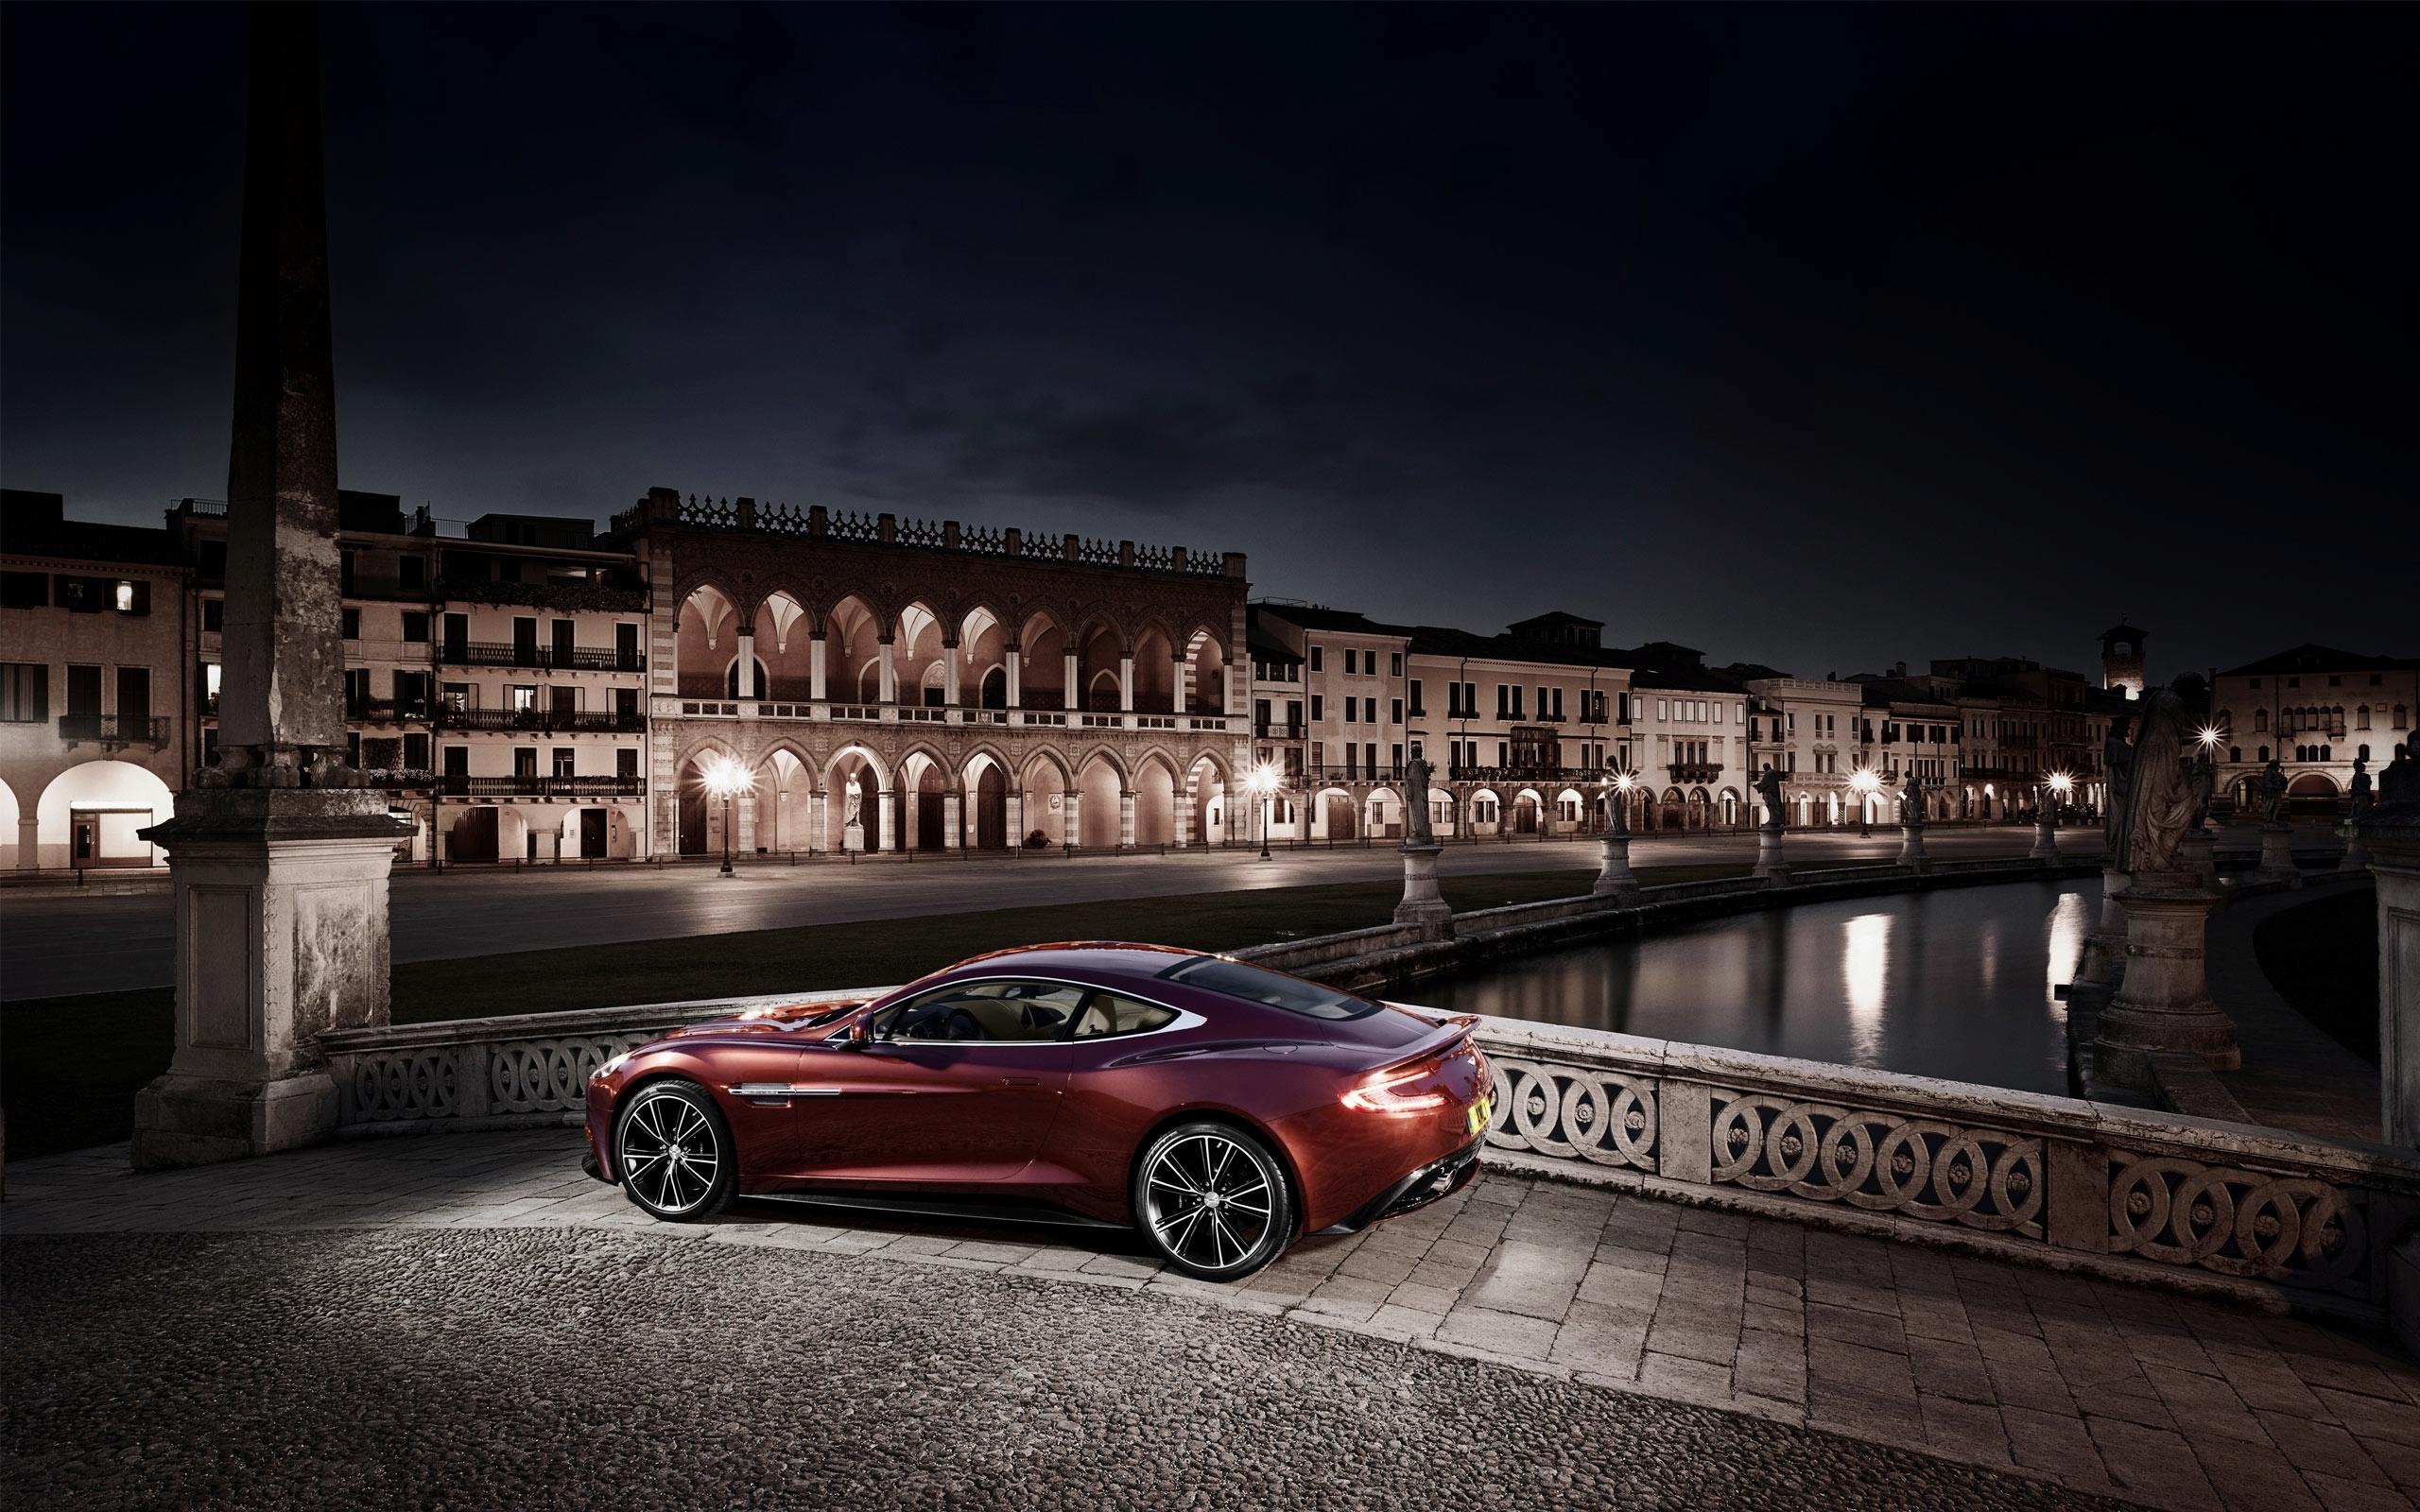 Aston Martin суперкар ночь город  № 2374783 загрузить